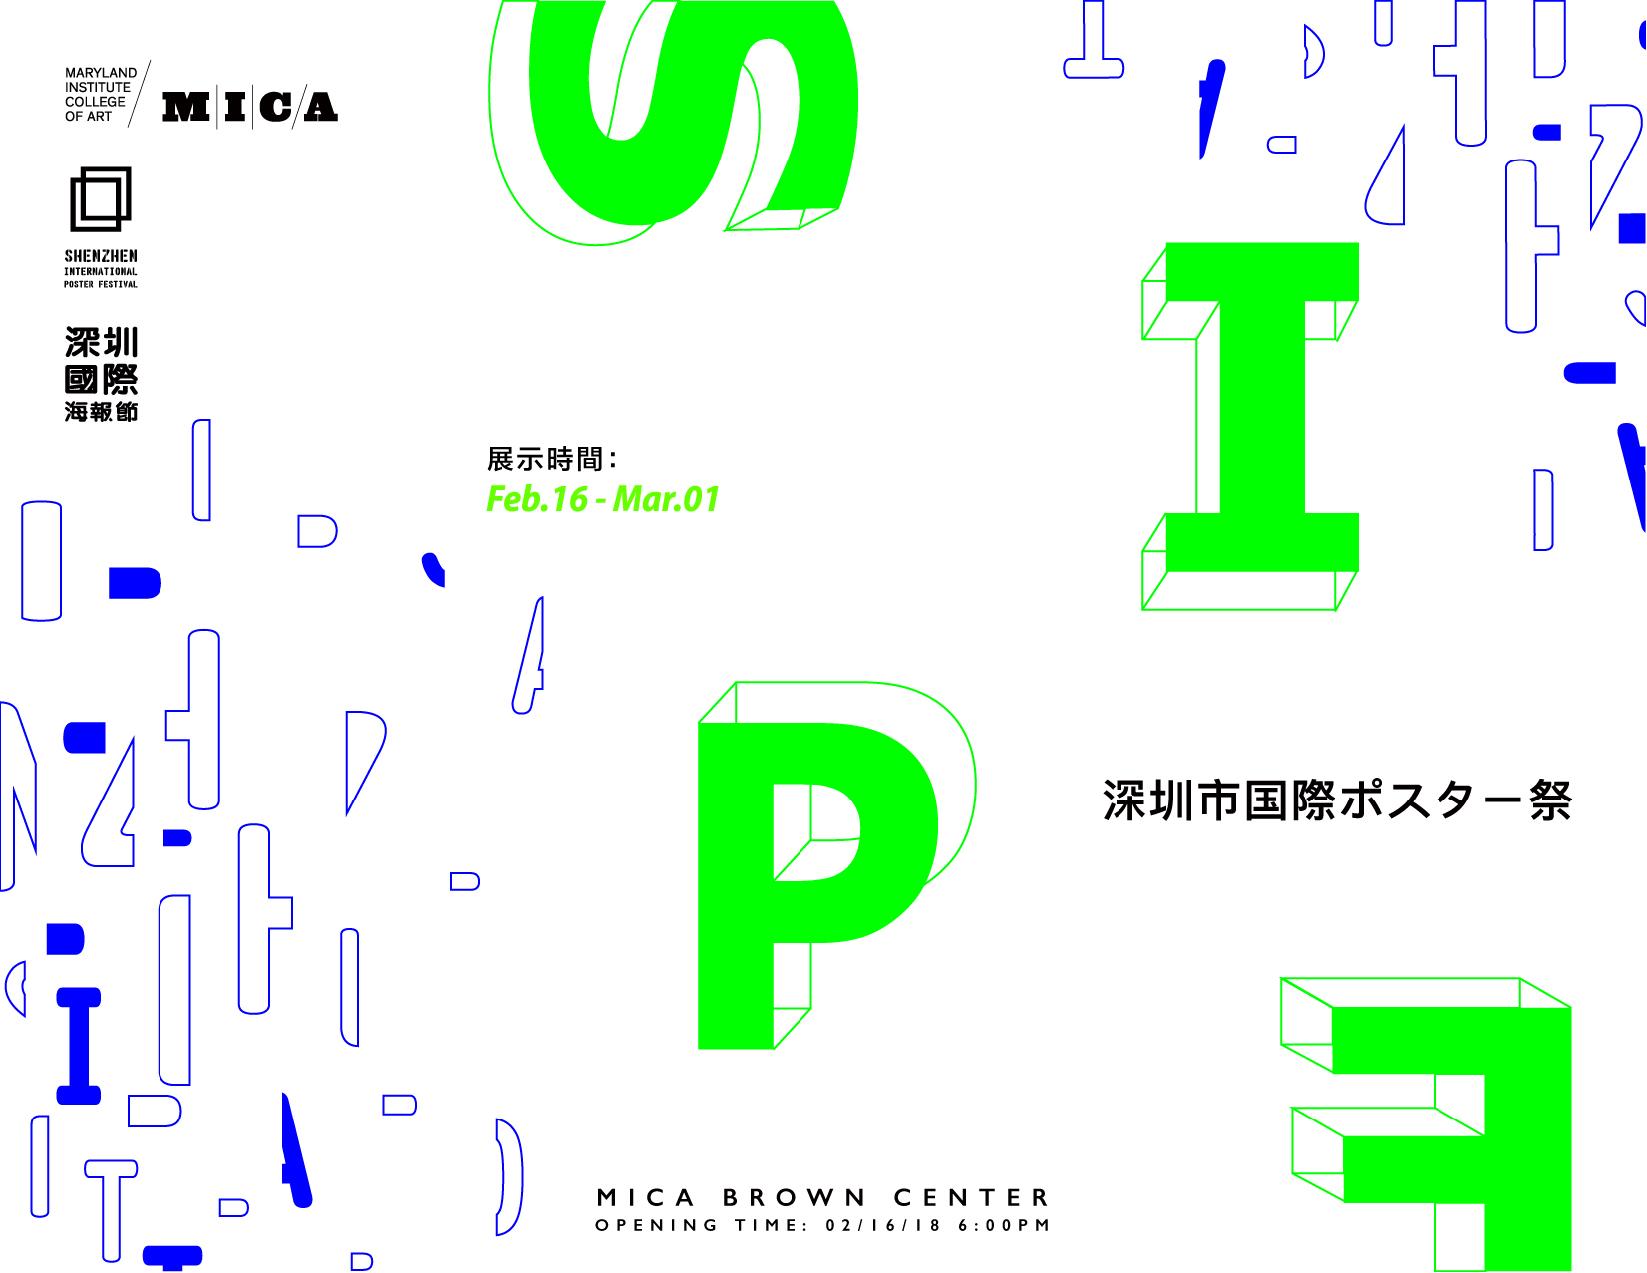 card-design-03.jpg